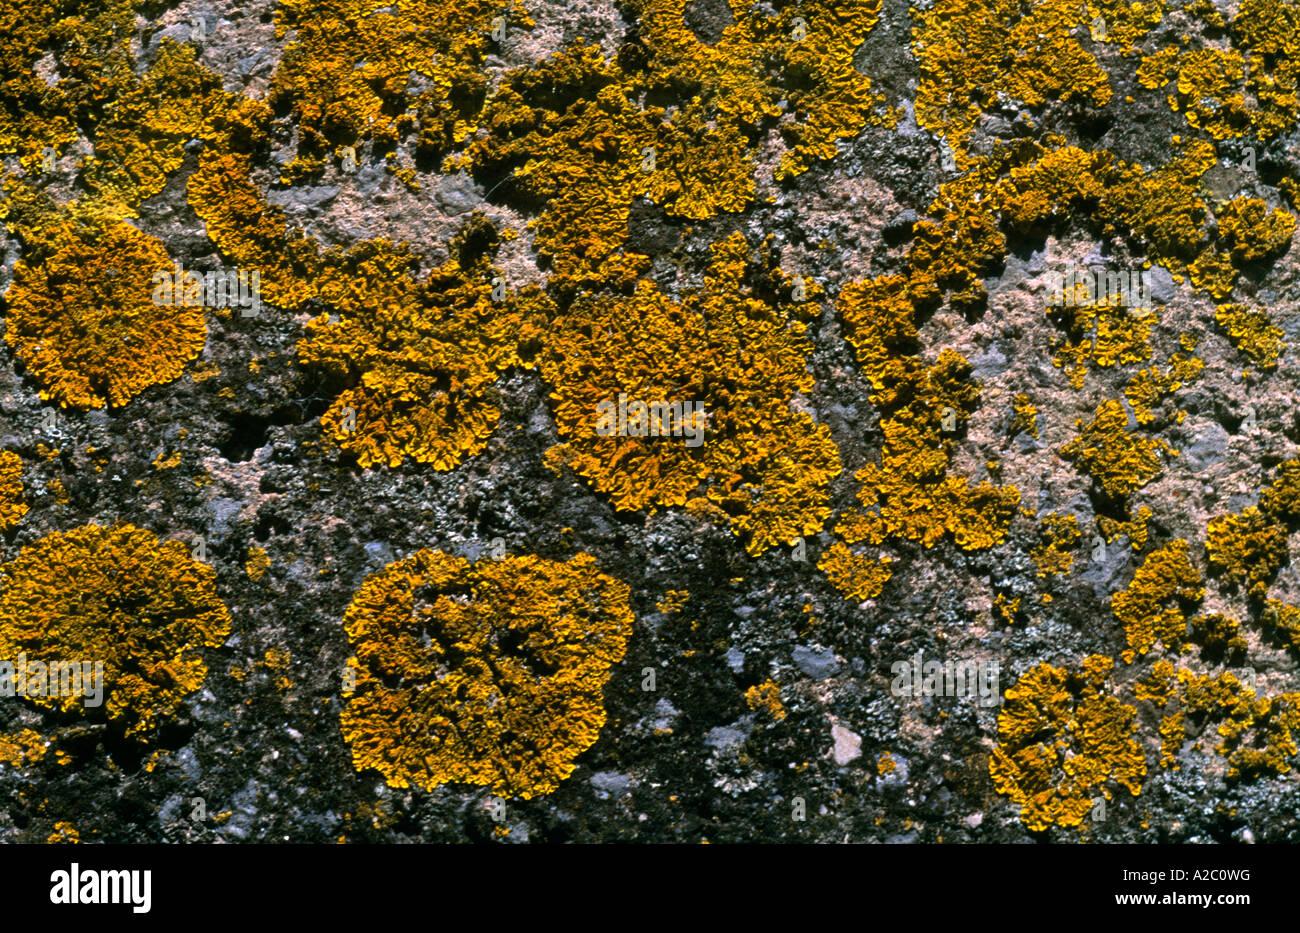 Yellow Lichen On Rock - Stock Image